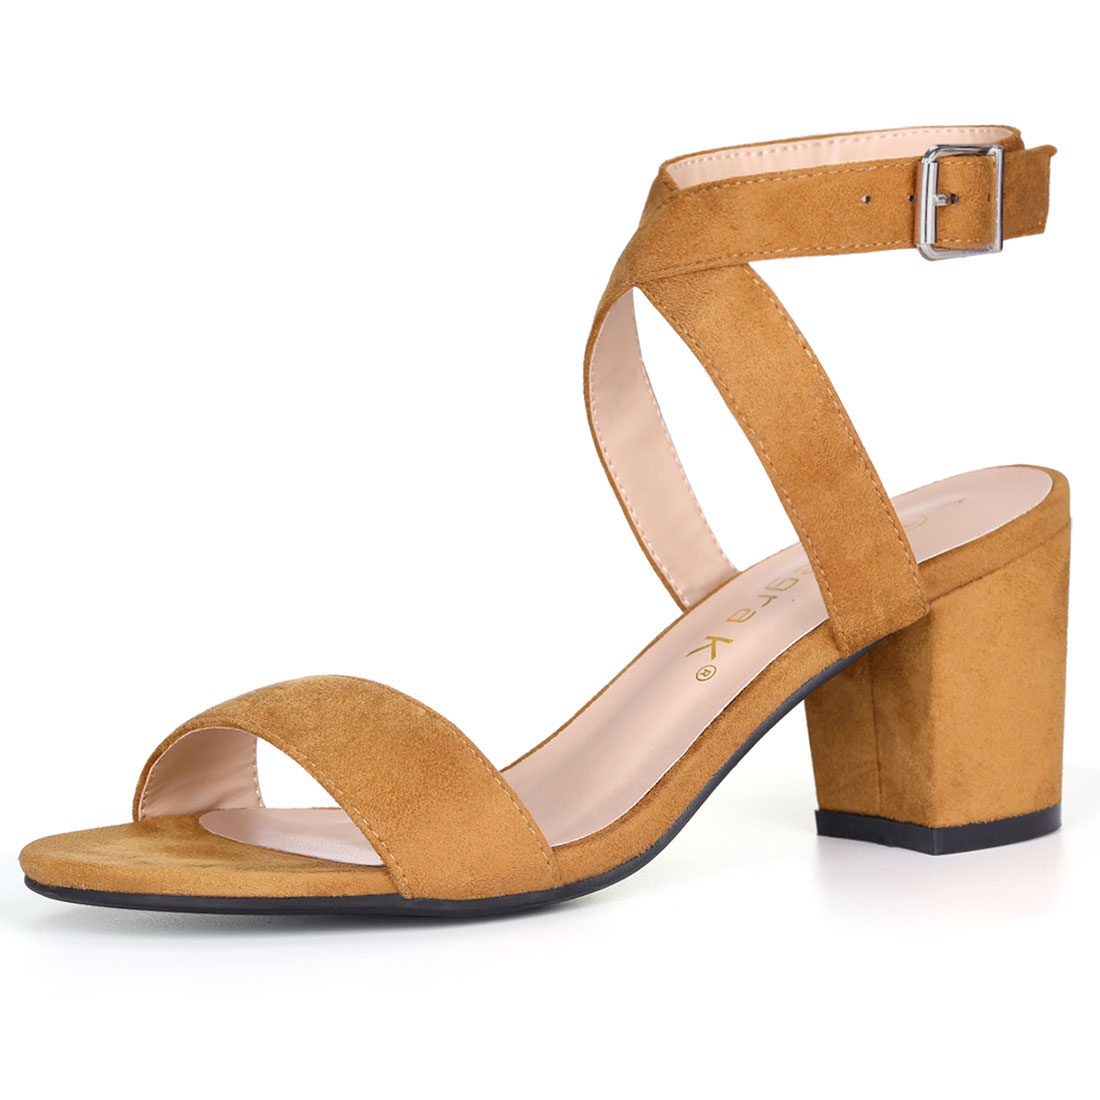 Allegra K Women's Crisscross Mid Block Heel Ankle Strap Sandals Brown US 7